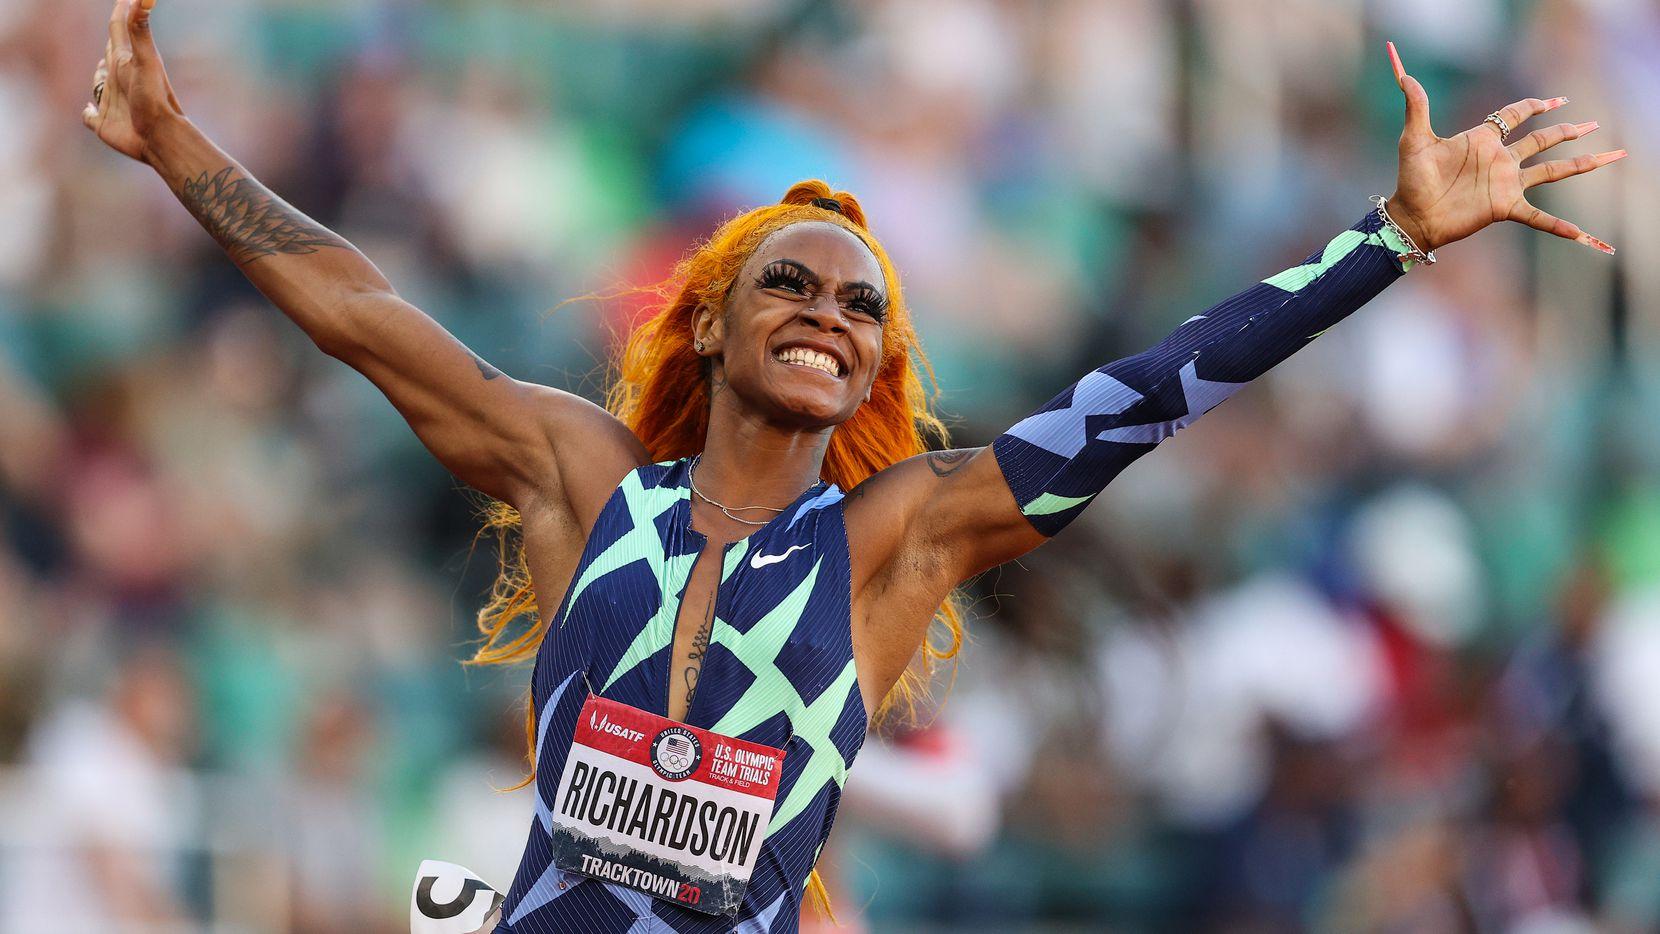 La originaria de Dallas, Sha'Carri Richardson celebra su triunfo en la prueba de los 100 metros planos celebrada el 19 de junio de 2021 en Eugene, Oregon.